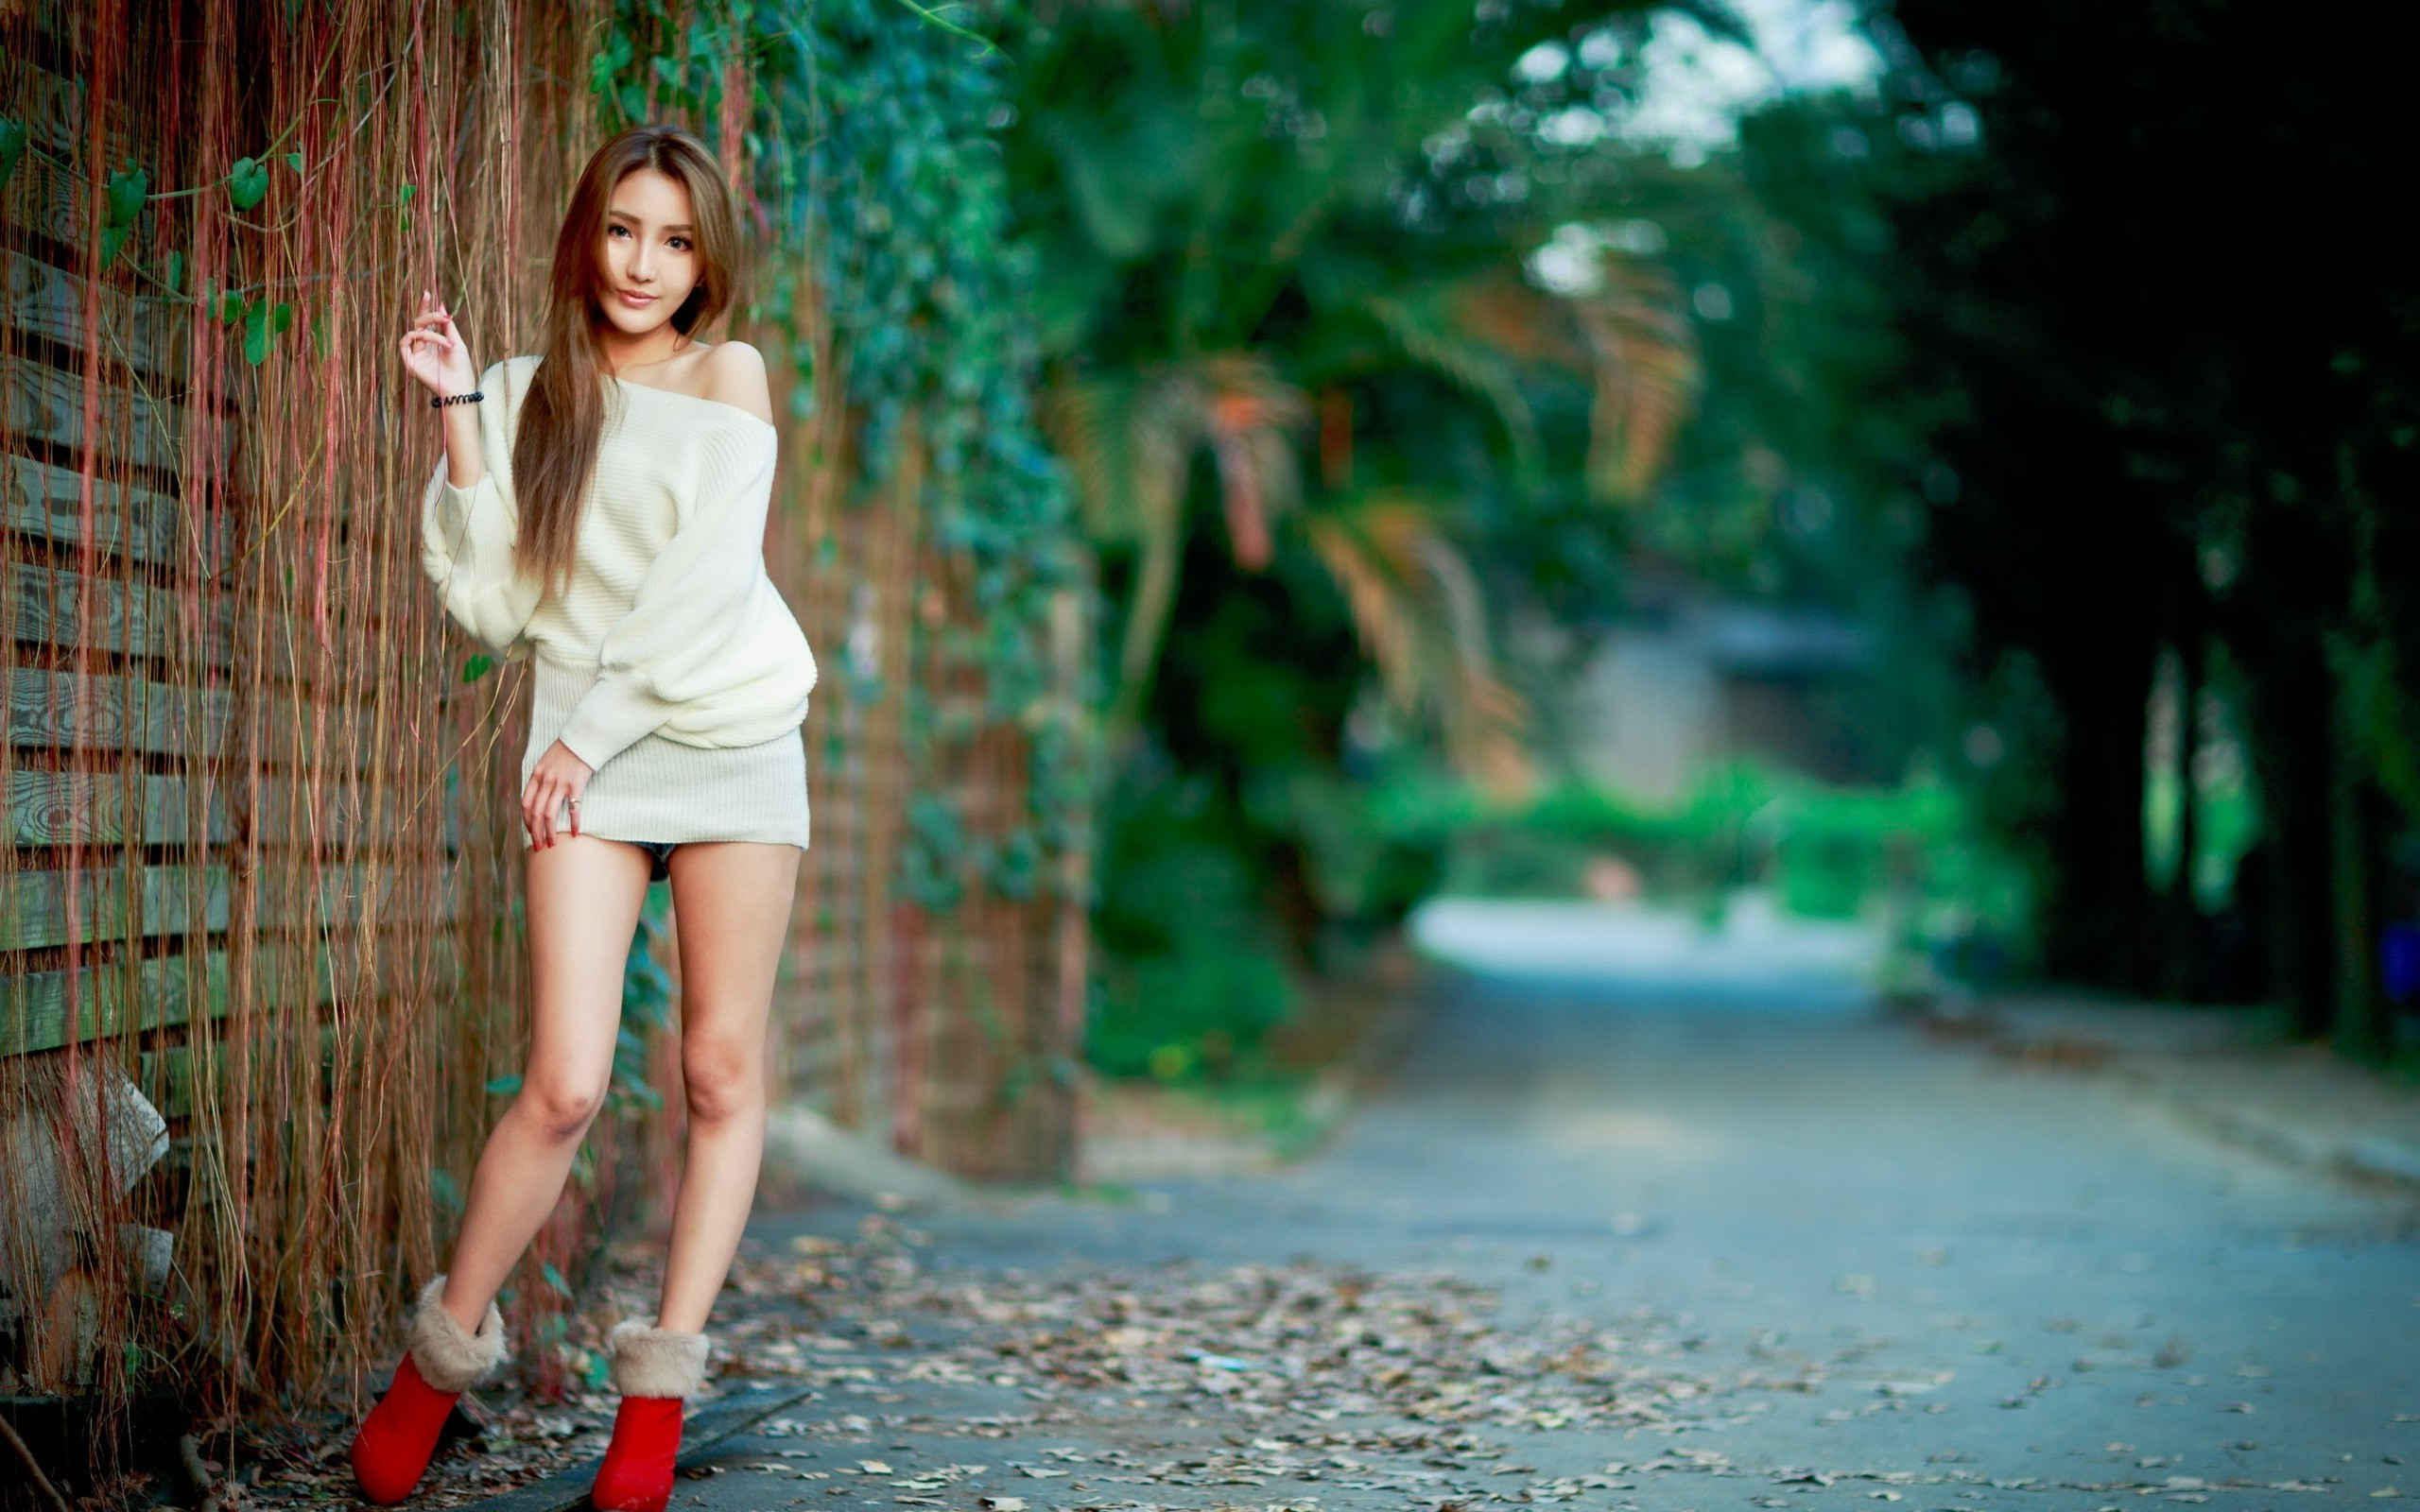 women Outdoors, Asian, Women, Model, Urban Wallpapers HD / Desktop and  Mobile Backgrounds